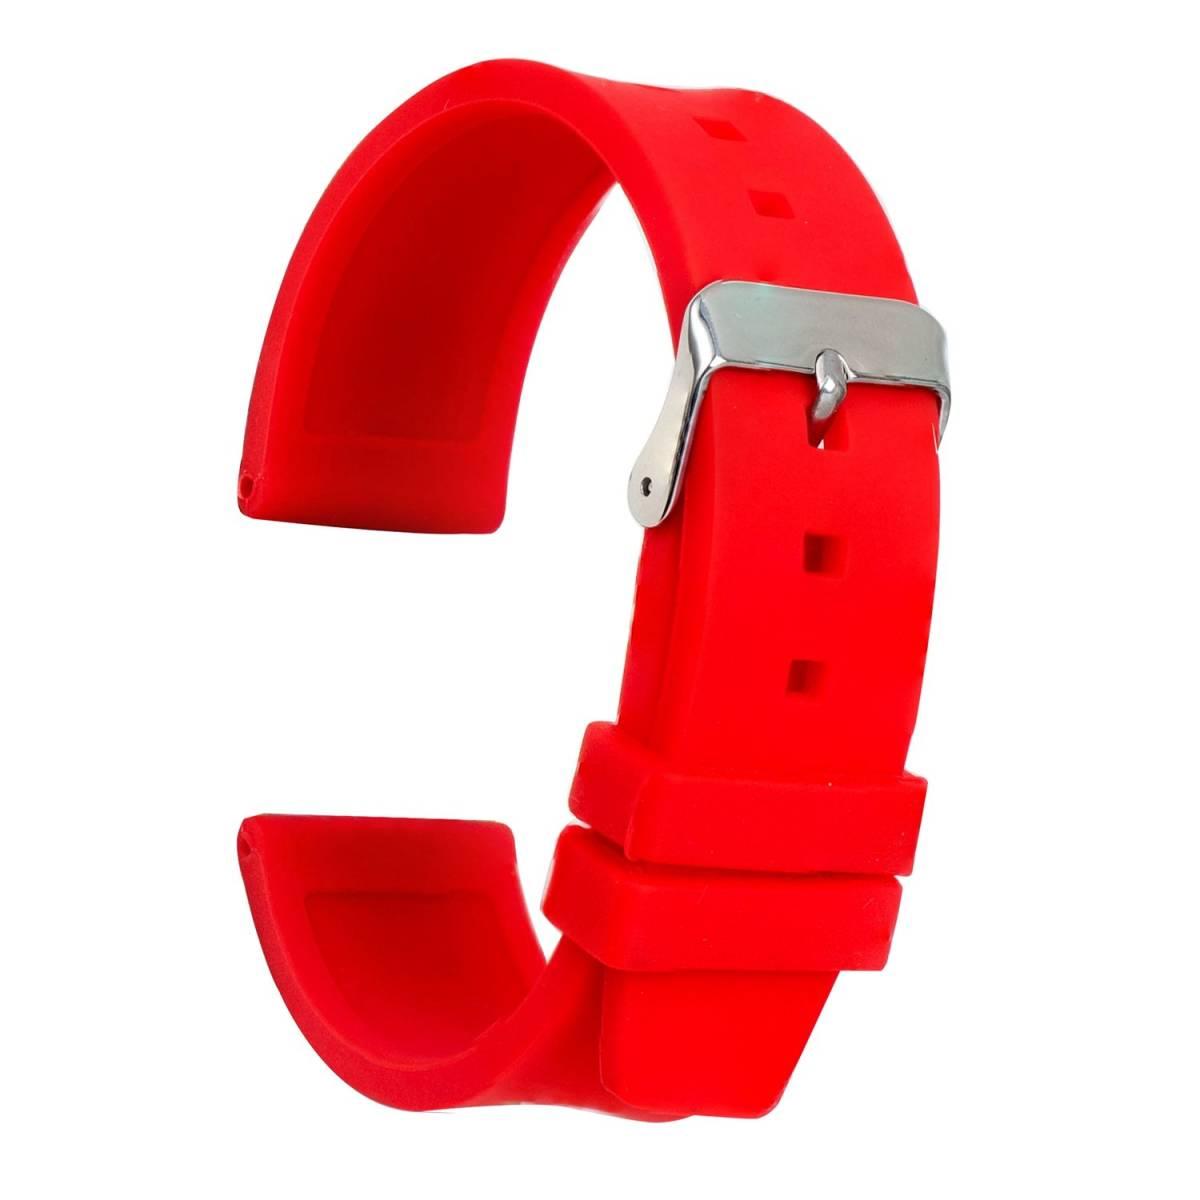 timeless design cc033 2edc9 代購代標第一品牌- 樂淘letao - Ullchro 時計ベルト時計シリコン ...